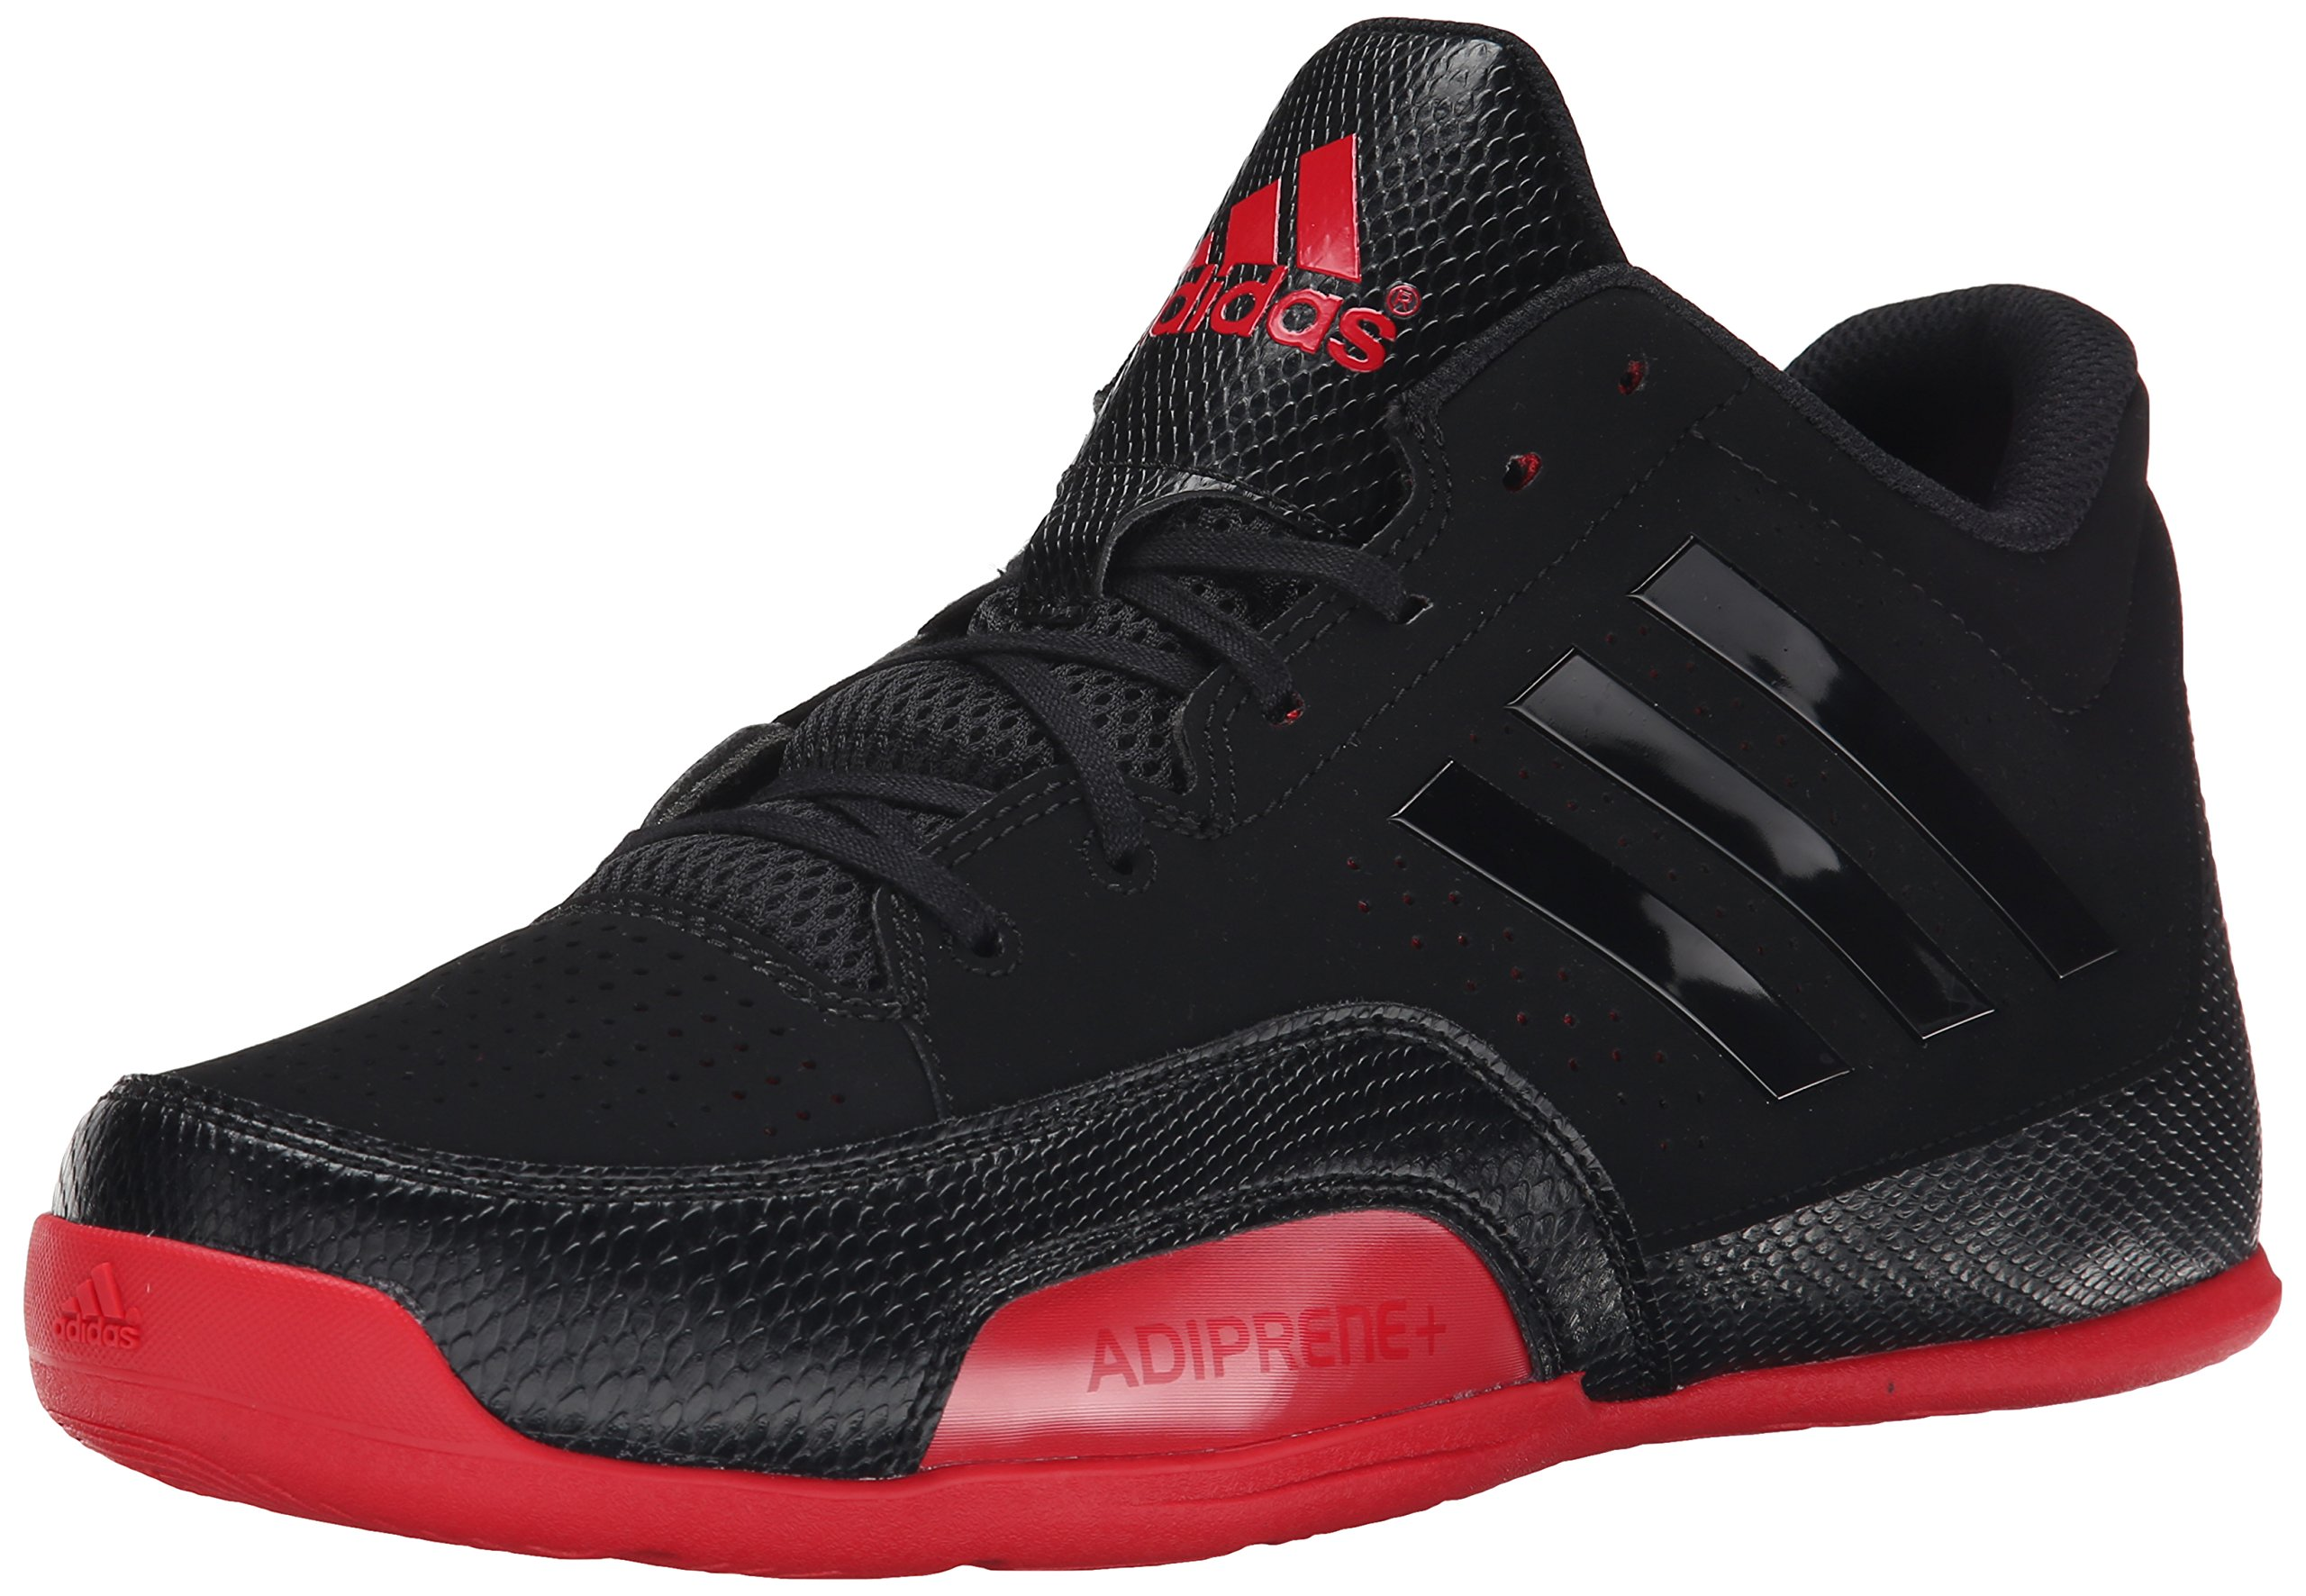 Adidas Adiprene Plus Basketball Shoes